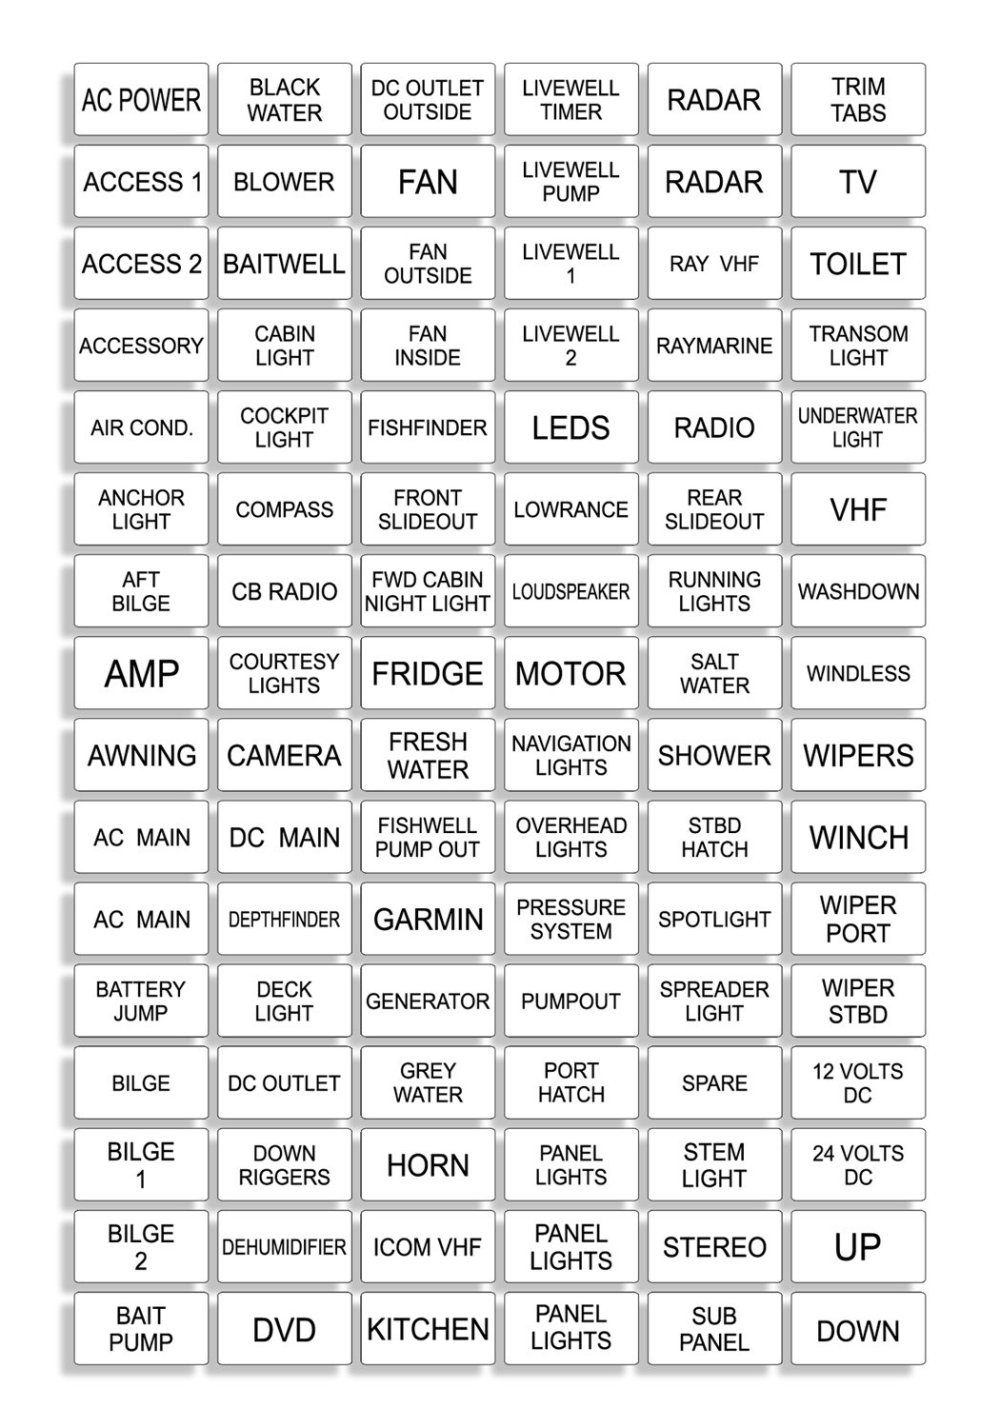 medium resolution of white marine boat dash board switch instrument panel decal sticker labels sheet light switch fuse description